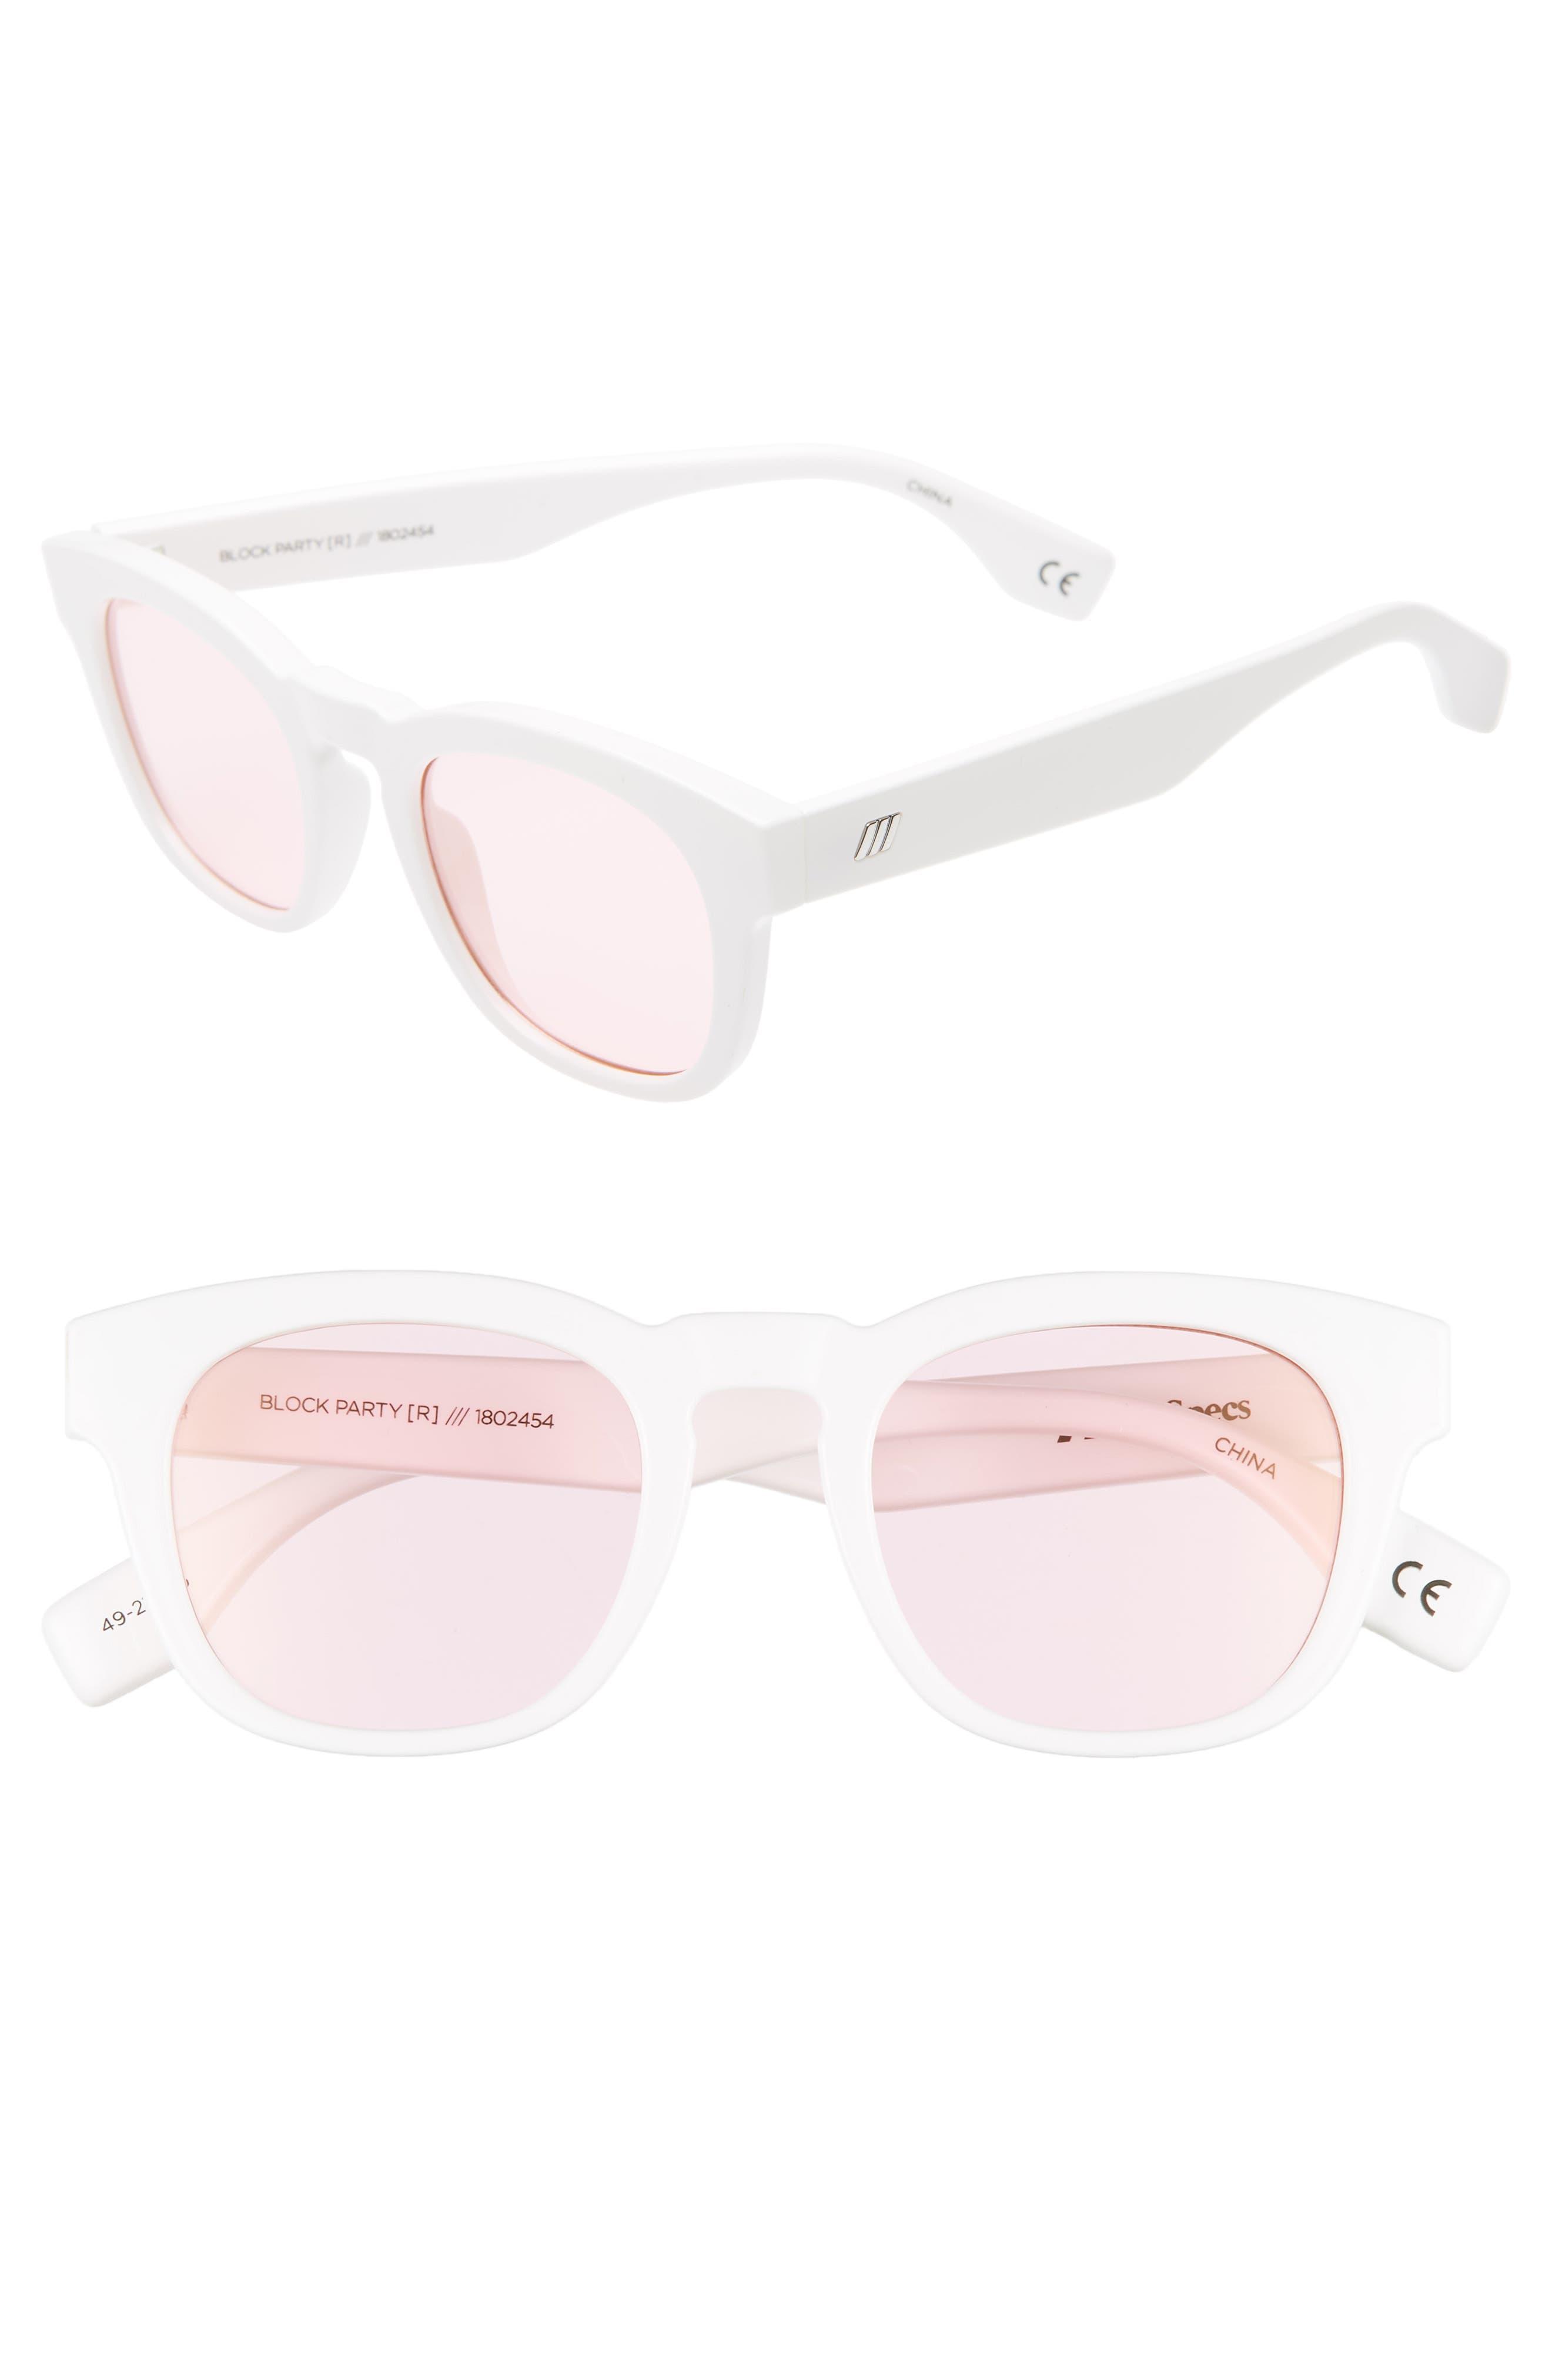 Le Specs Block Party 4m Round Sunglasses - Optic White